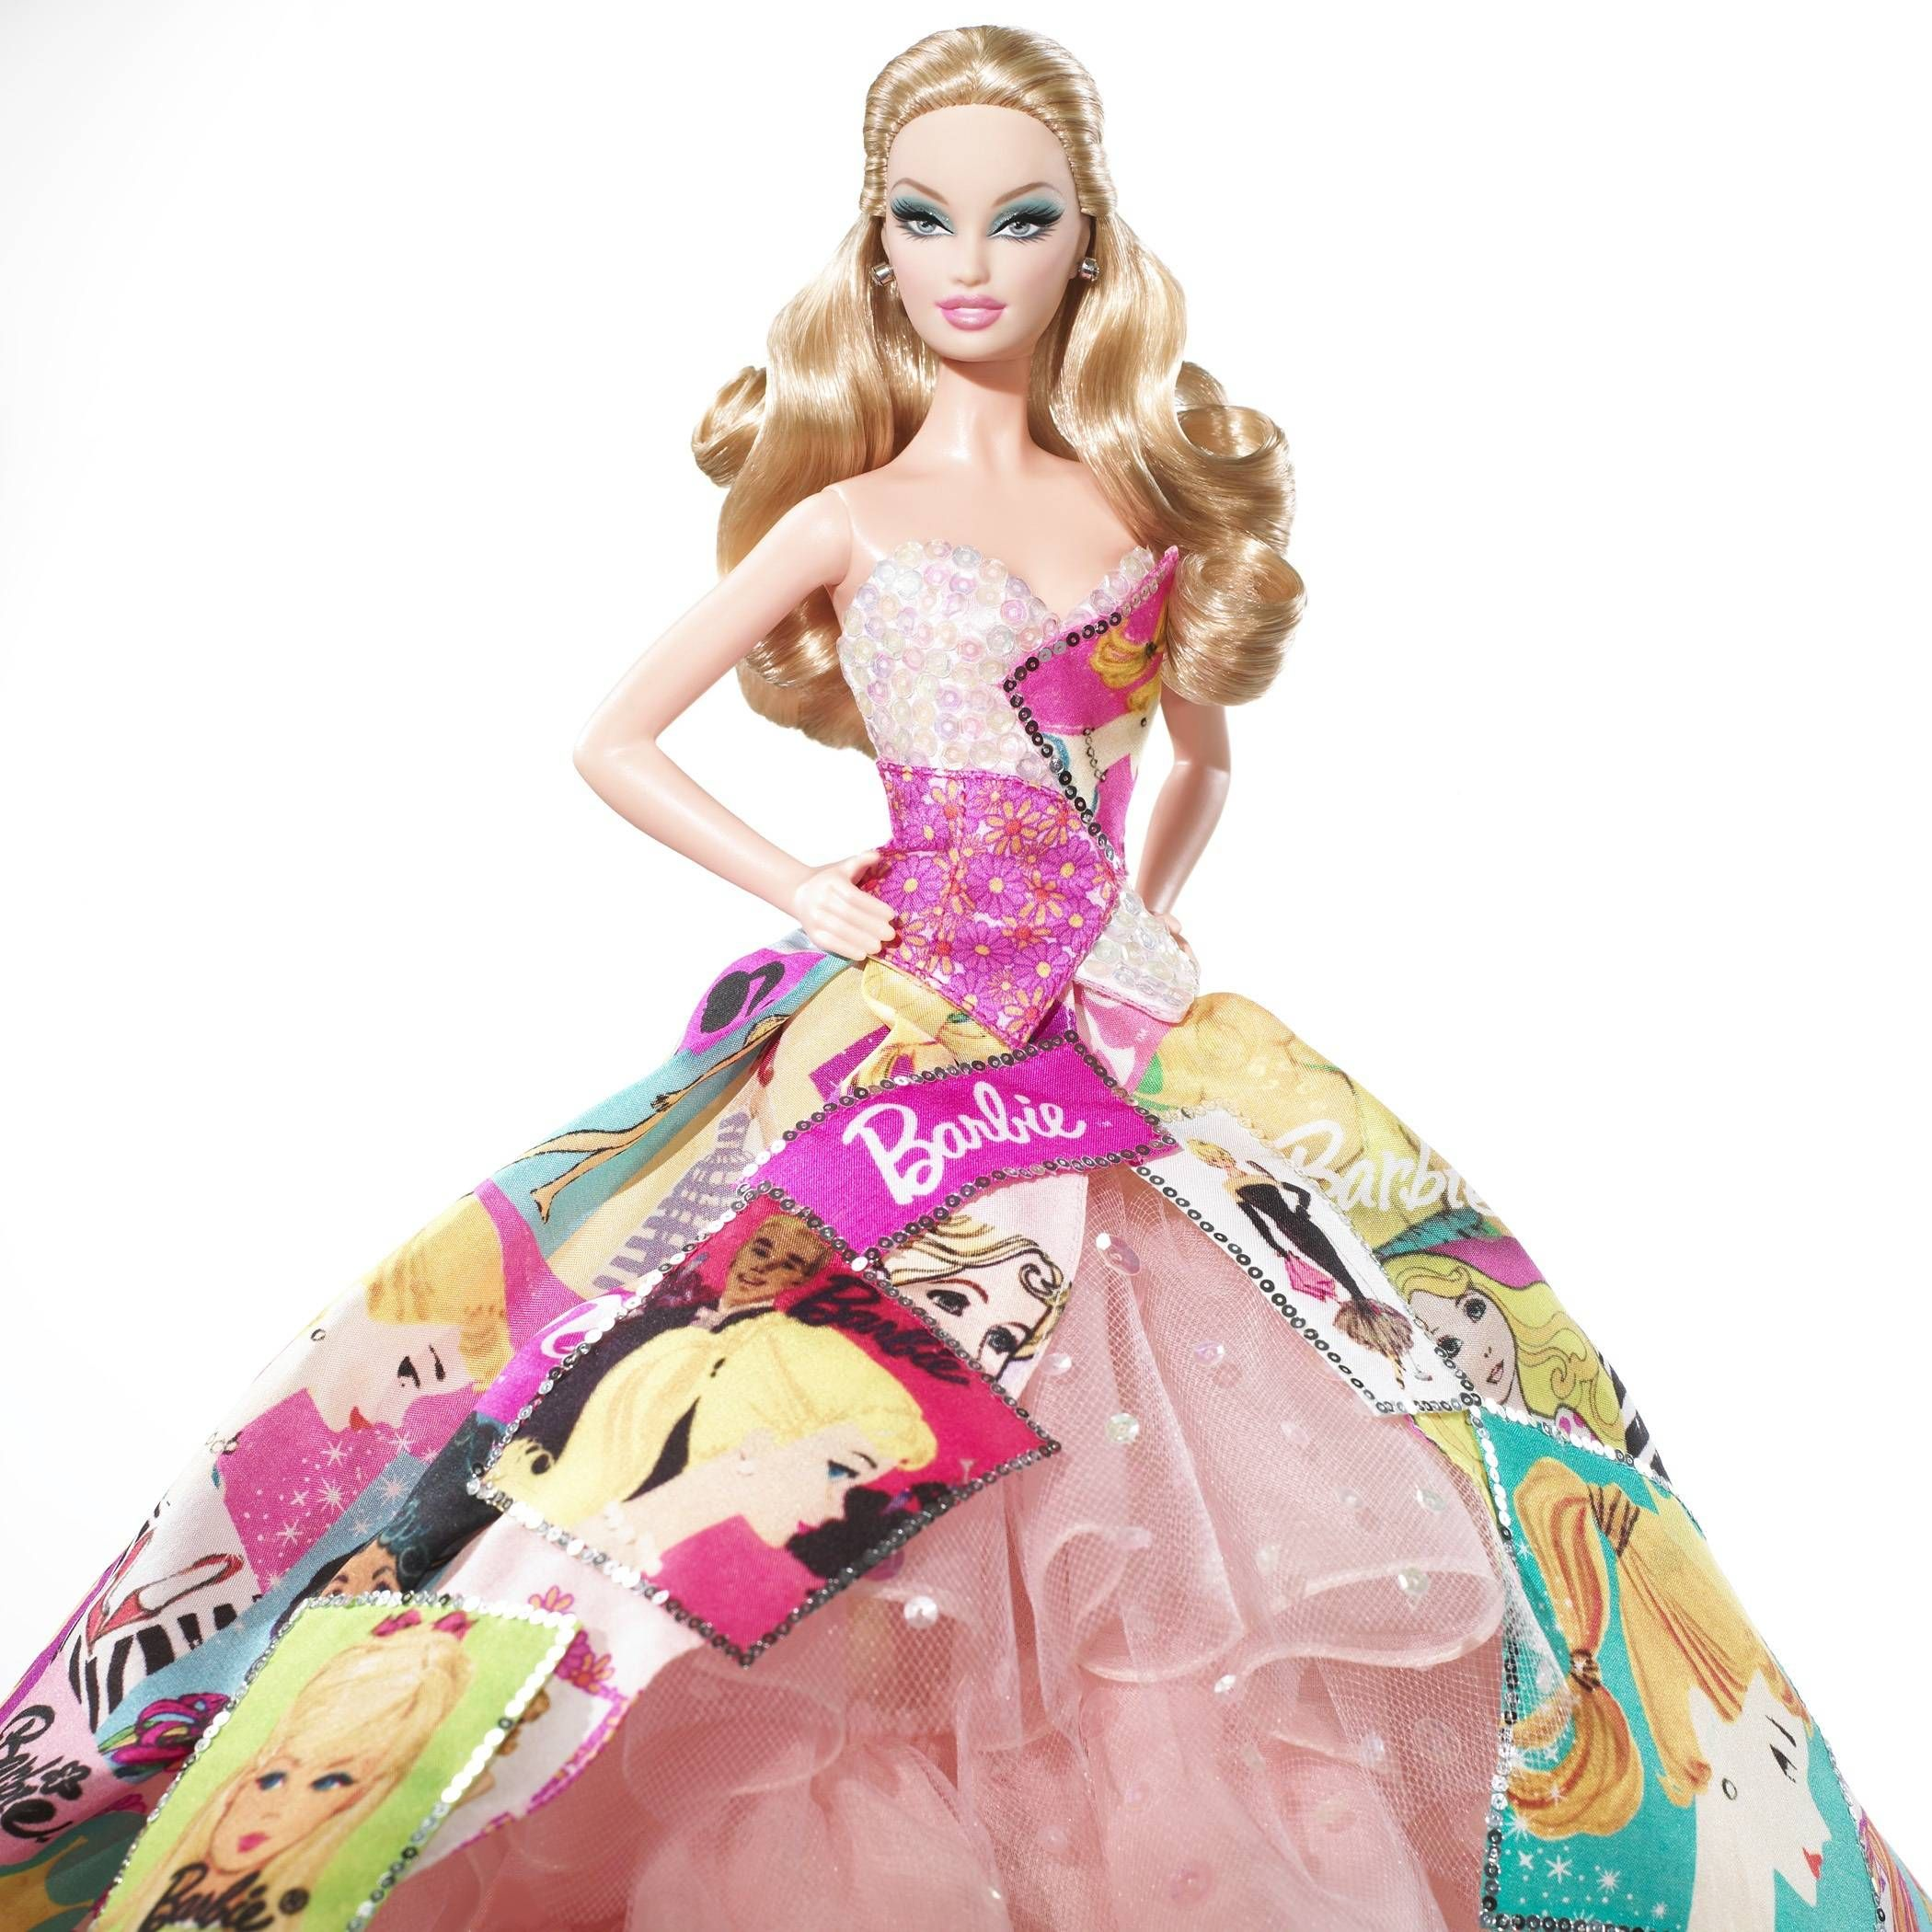 Barbie Cartoon | Barbie modern cartoons wallpapers vinodam small pictures